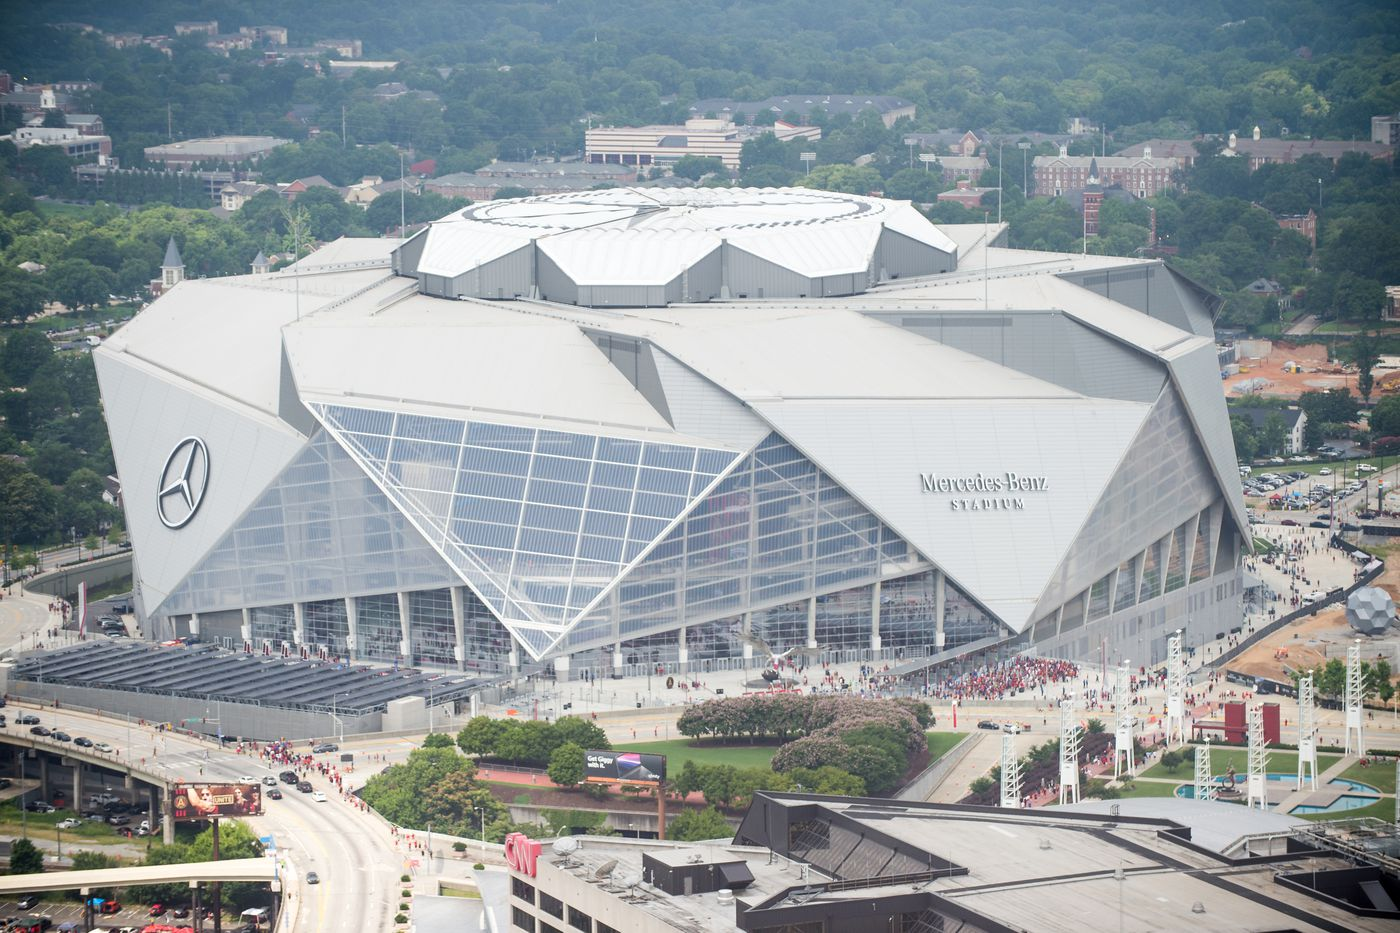 Super Bowl 53: Mercedes-Benz Stadium's 7 wildest features - SBNation.com